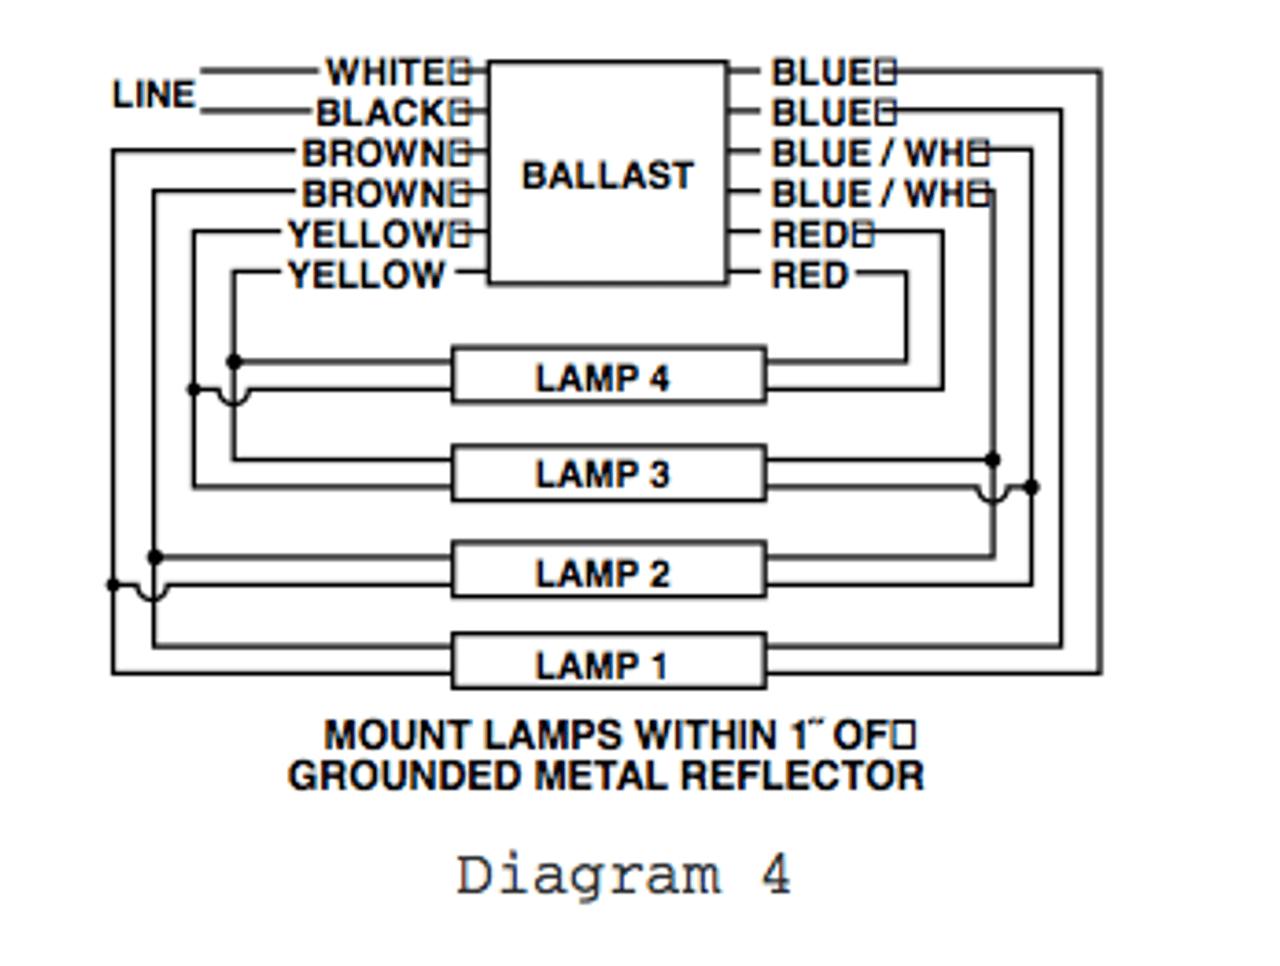 universal signa 256 496 800 t12 magnetic sign ballast256 496 800 signa wire diagram [ 1280 x 966 Pixel ]